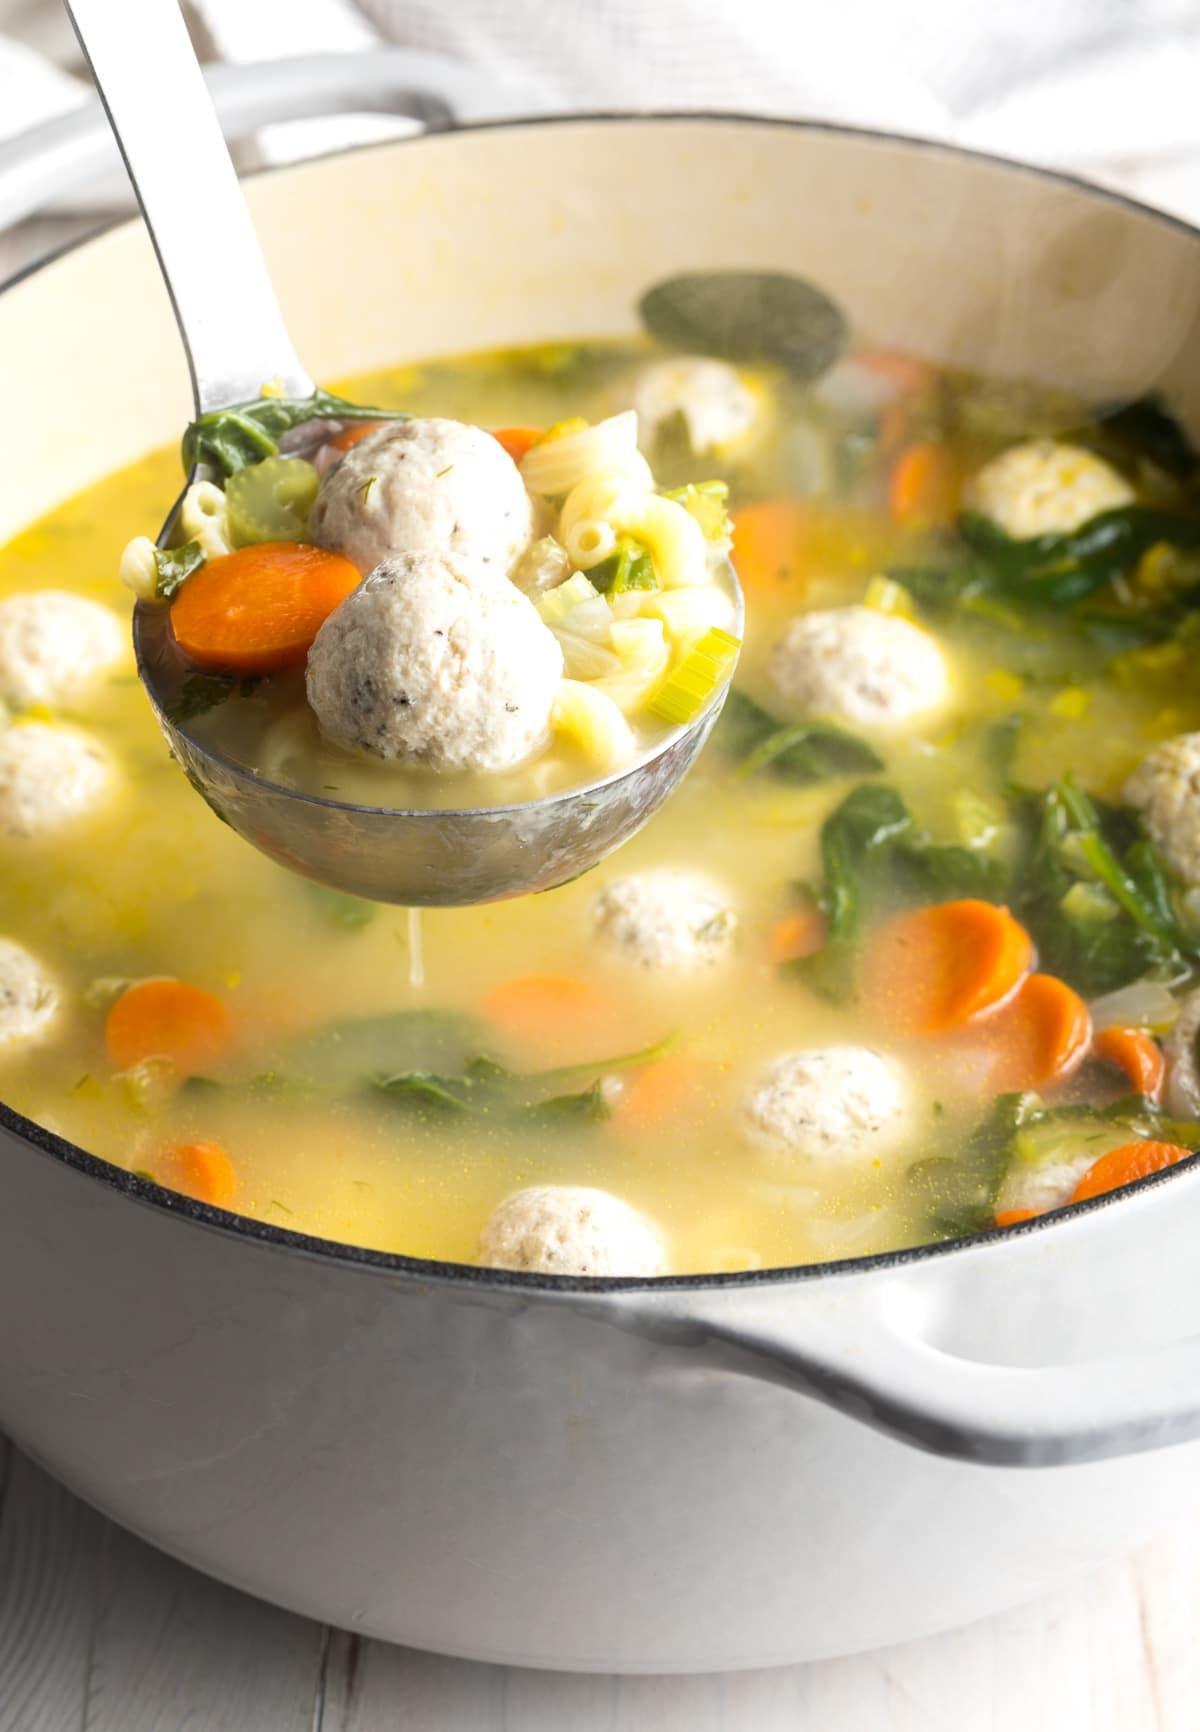 Italian Wedding Soup Can.Healthy Italian Wedding Soup